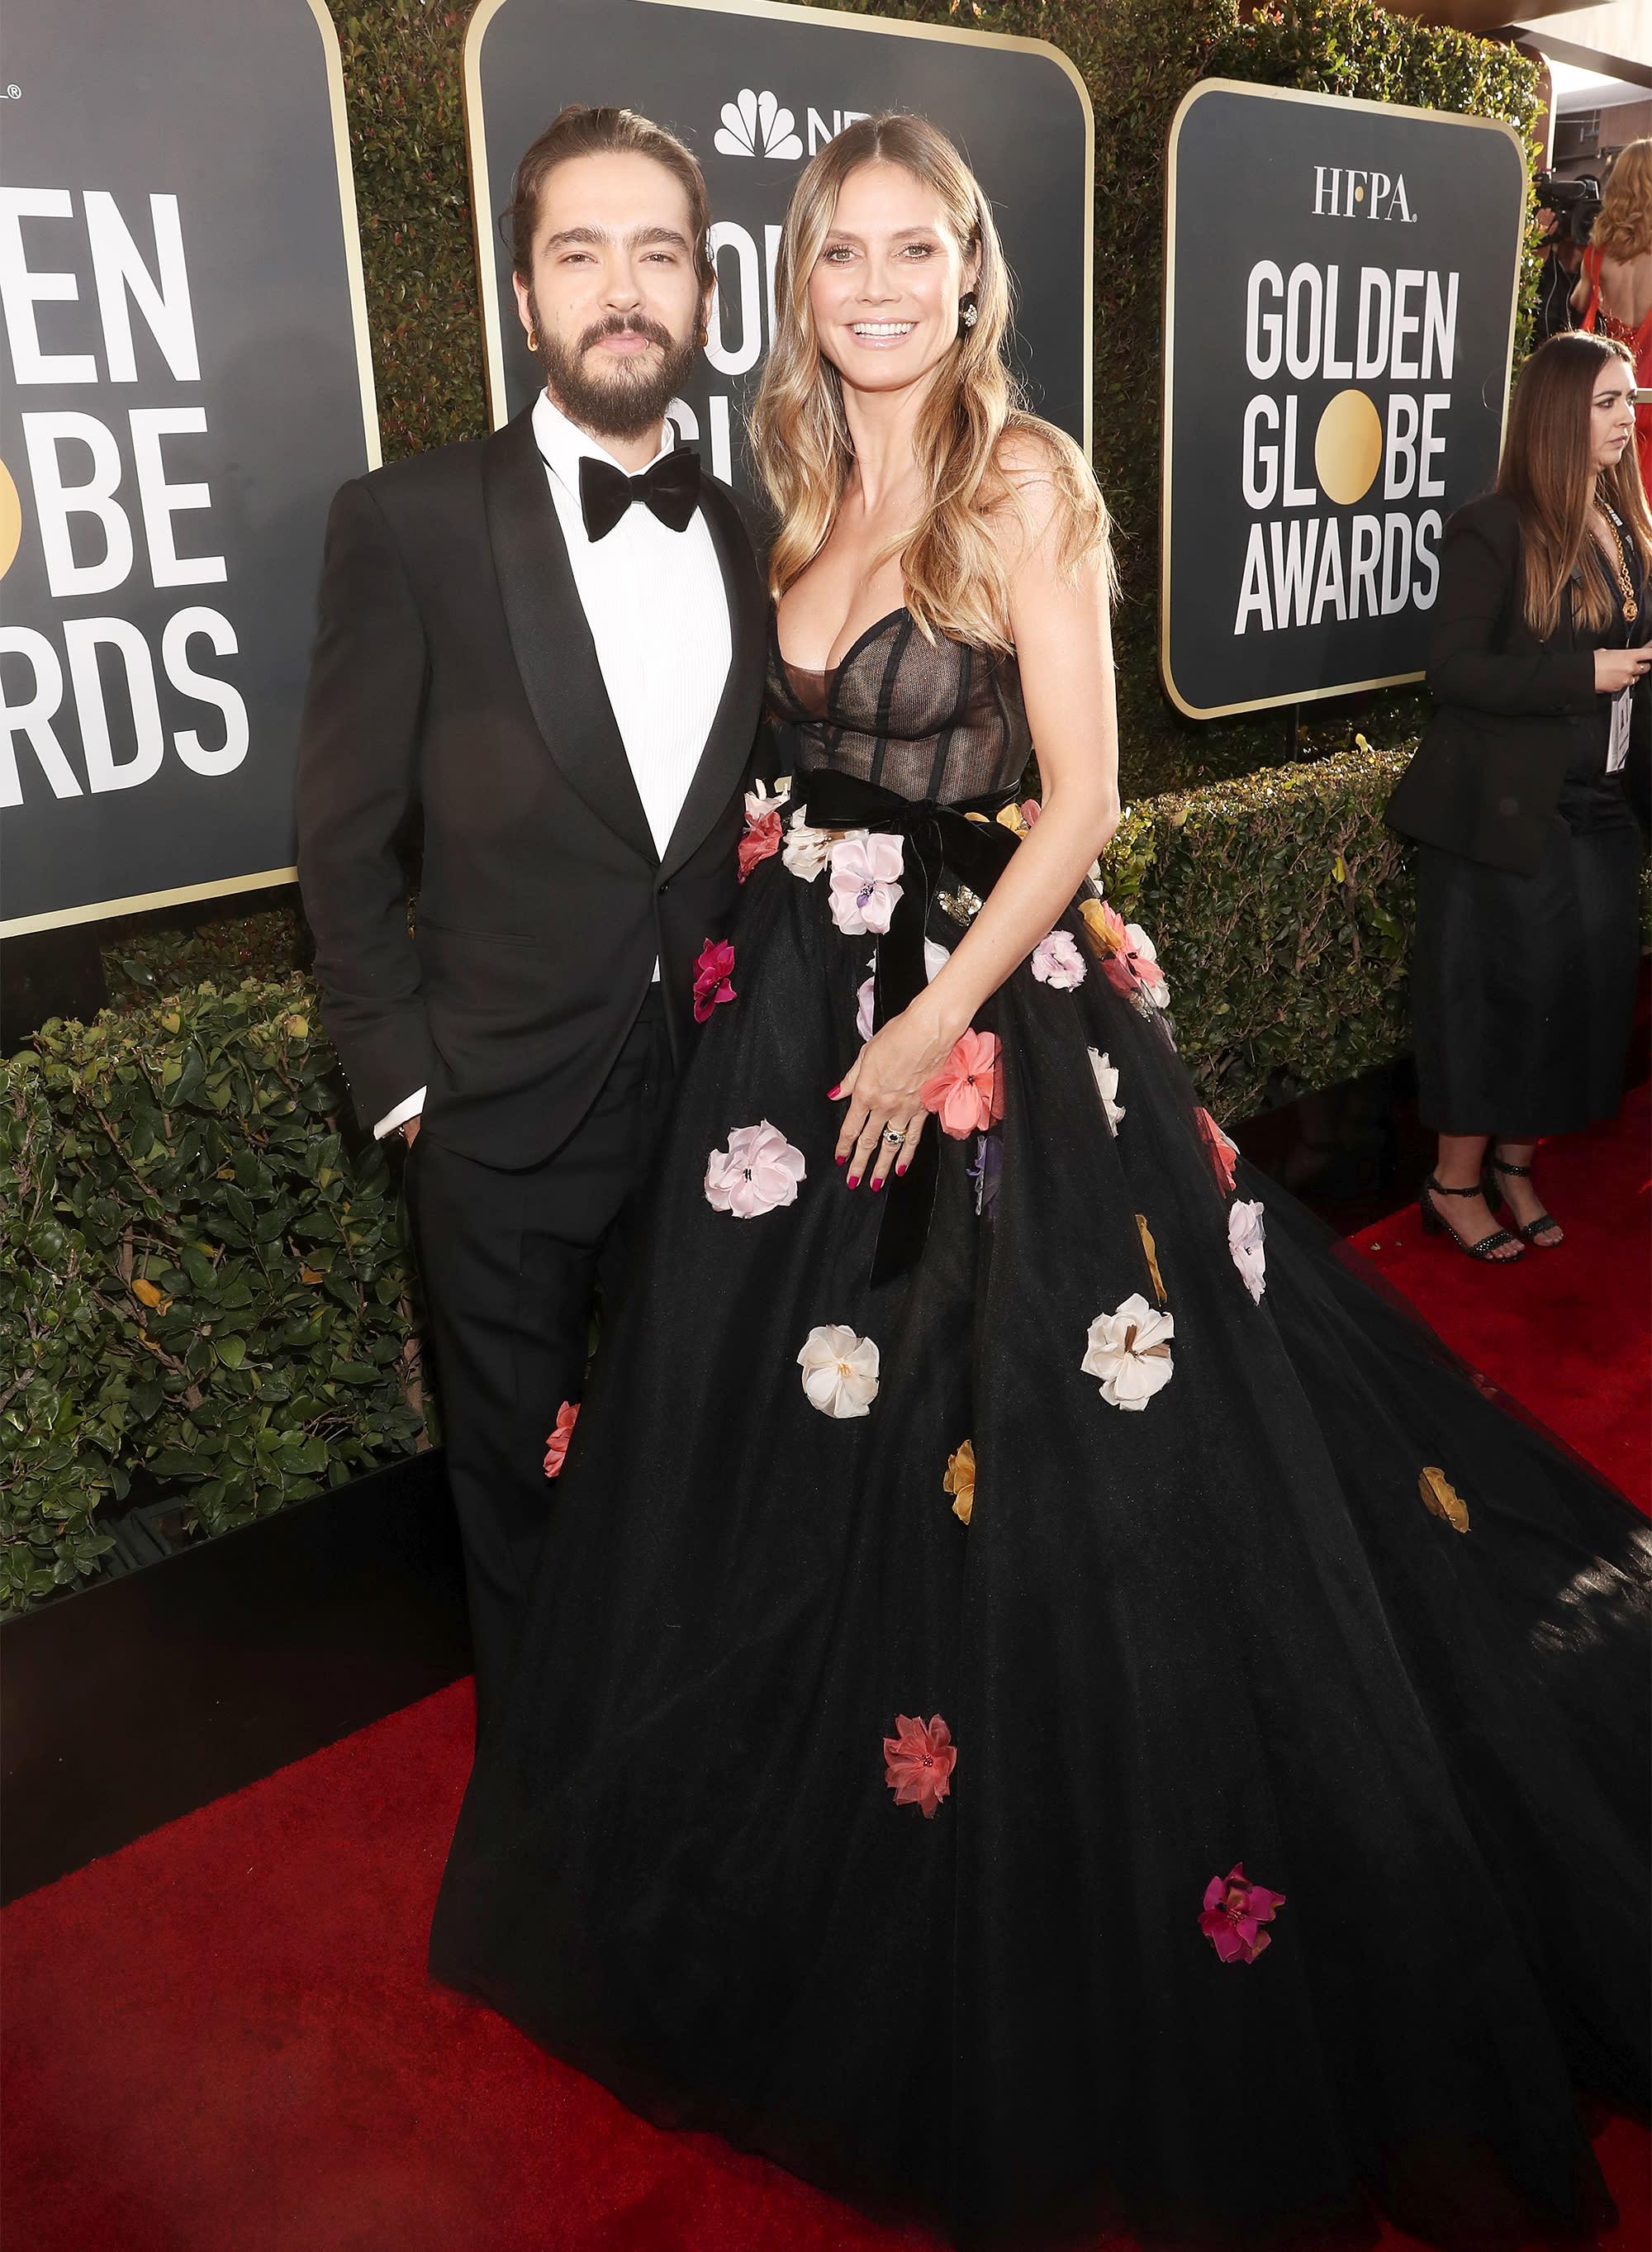 Heidi Klum And Fiance Tom Kaulitz Walk First Red Carpet Since